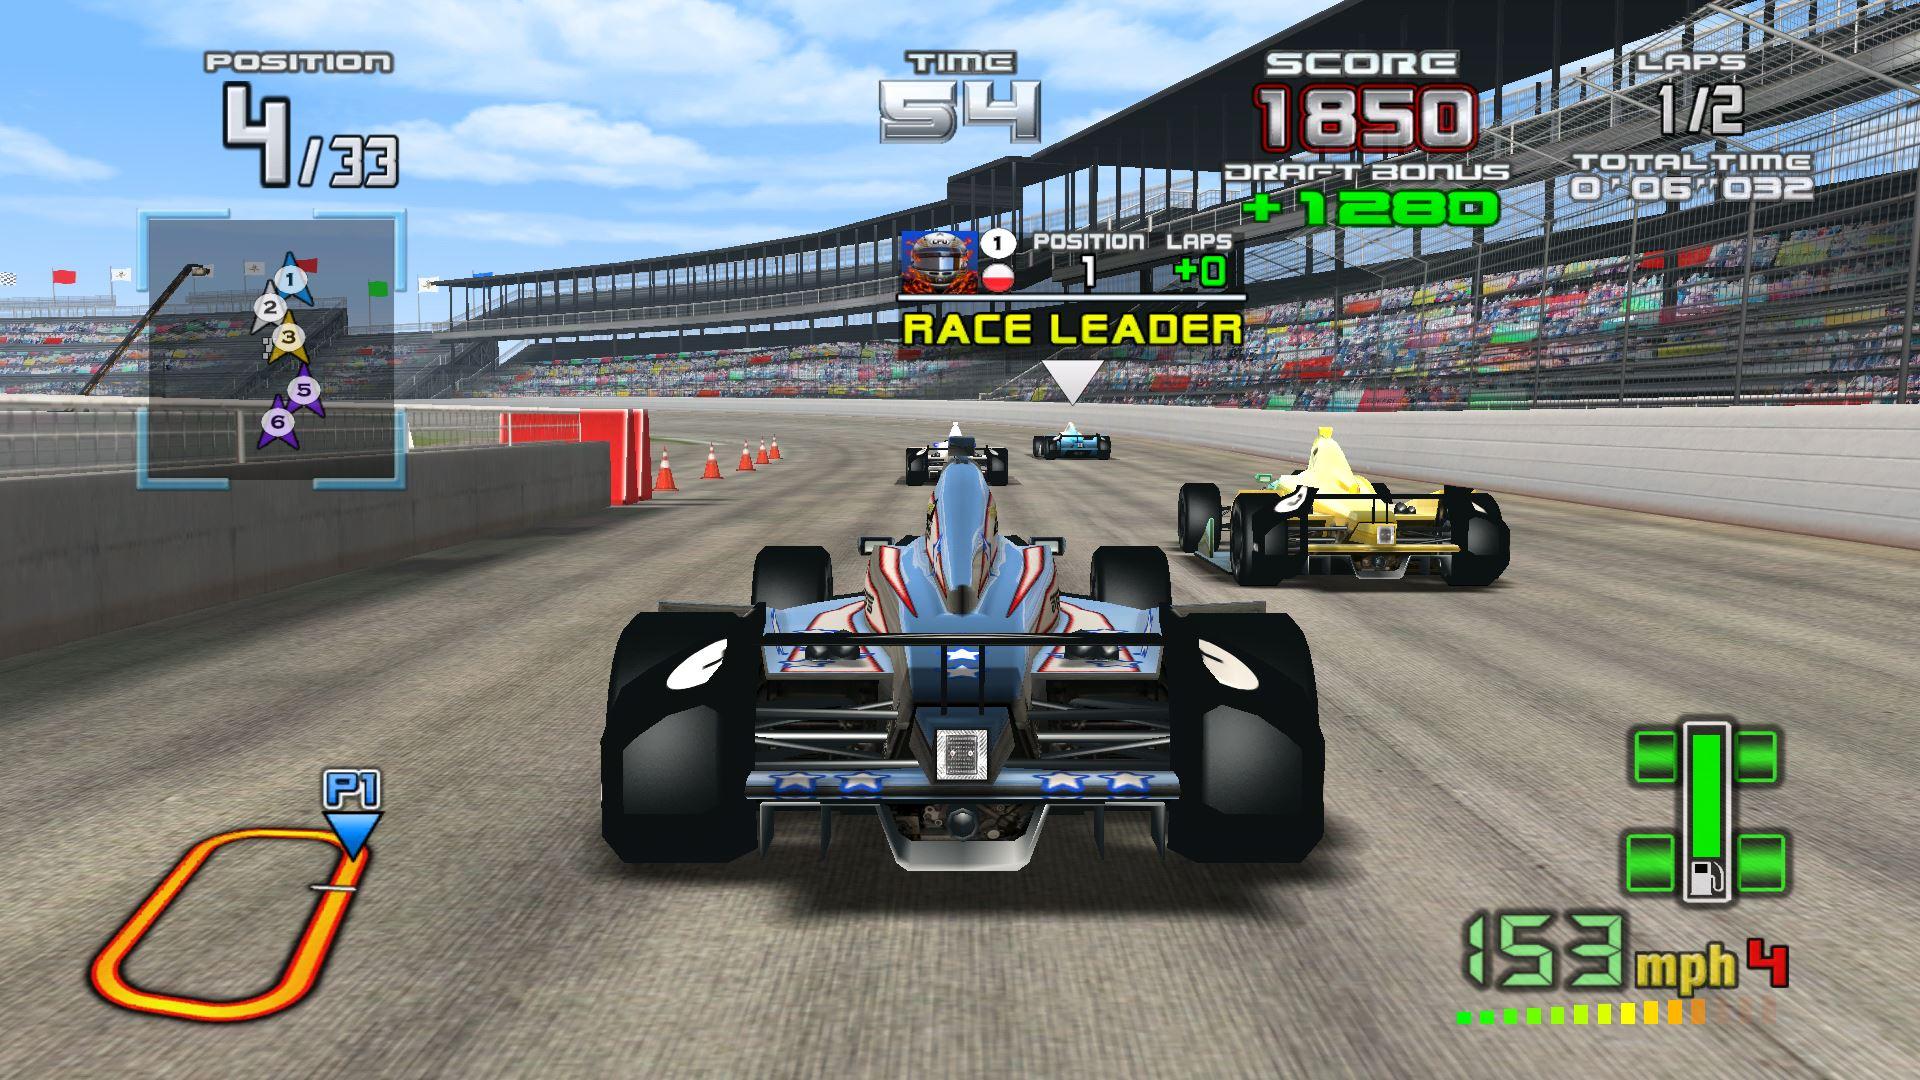 indy 500 arcade racing apk